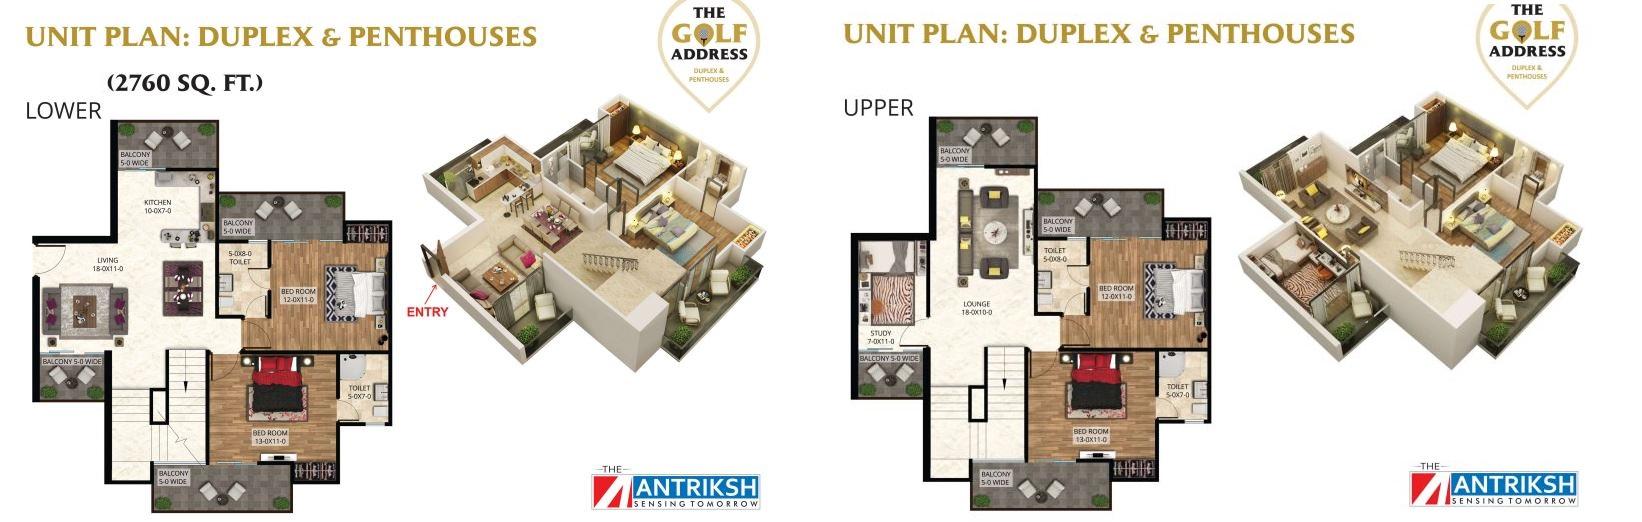 antriksh the golf address penthouse 4bhk st 2760sqft 1